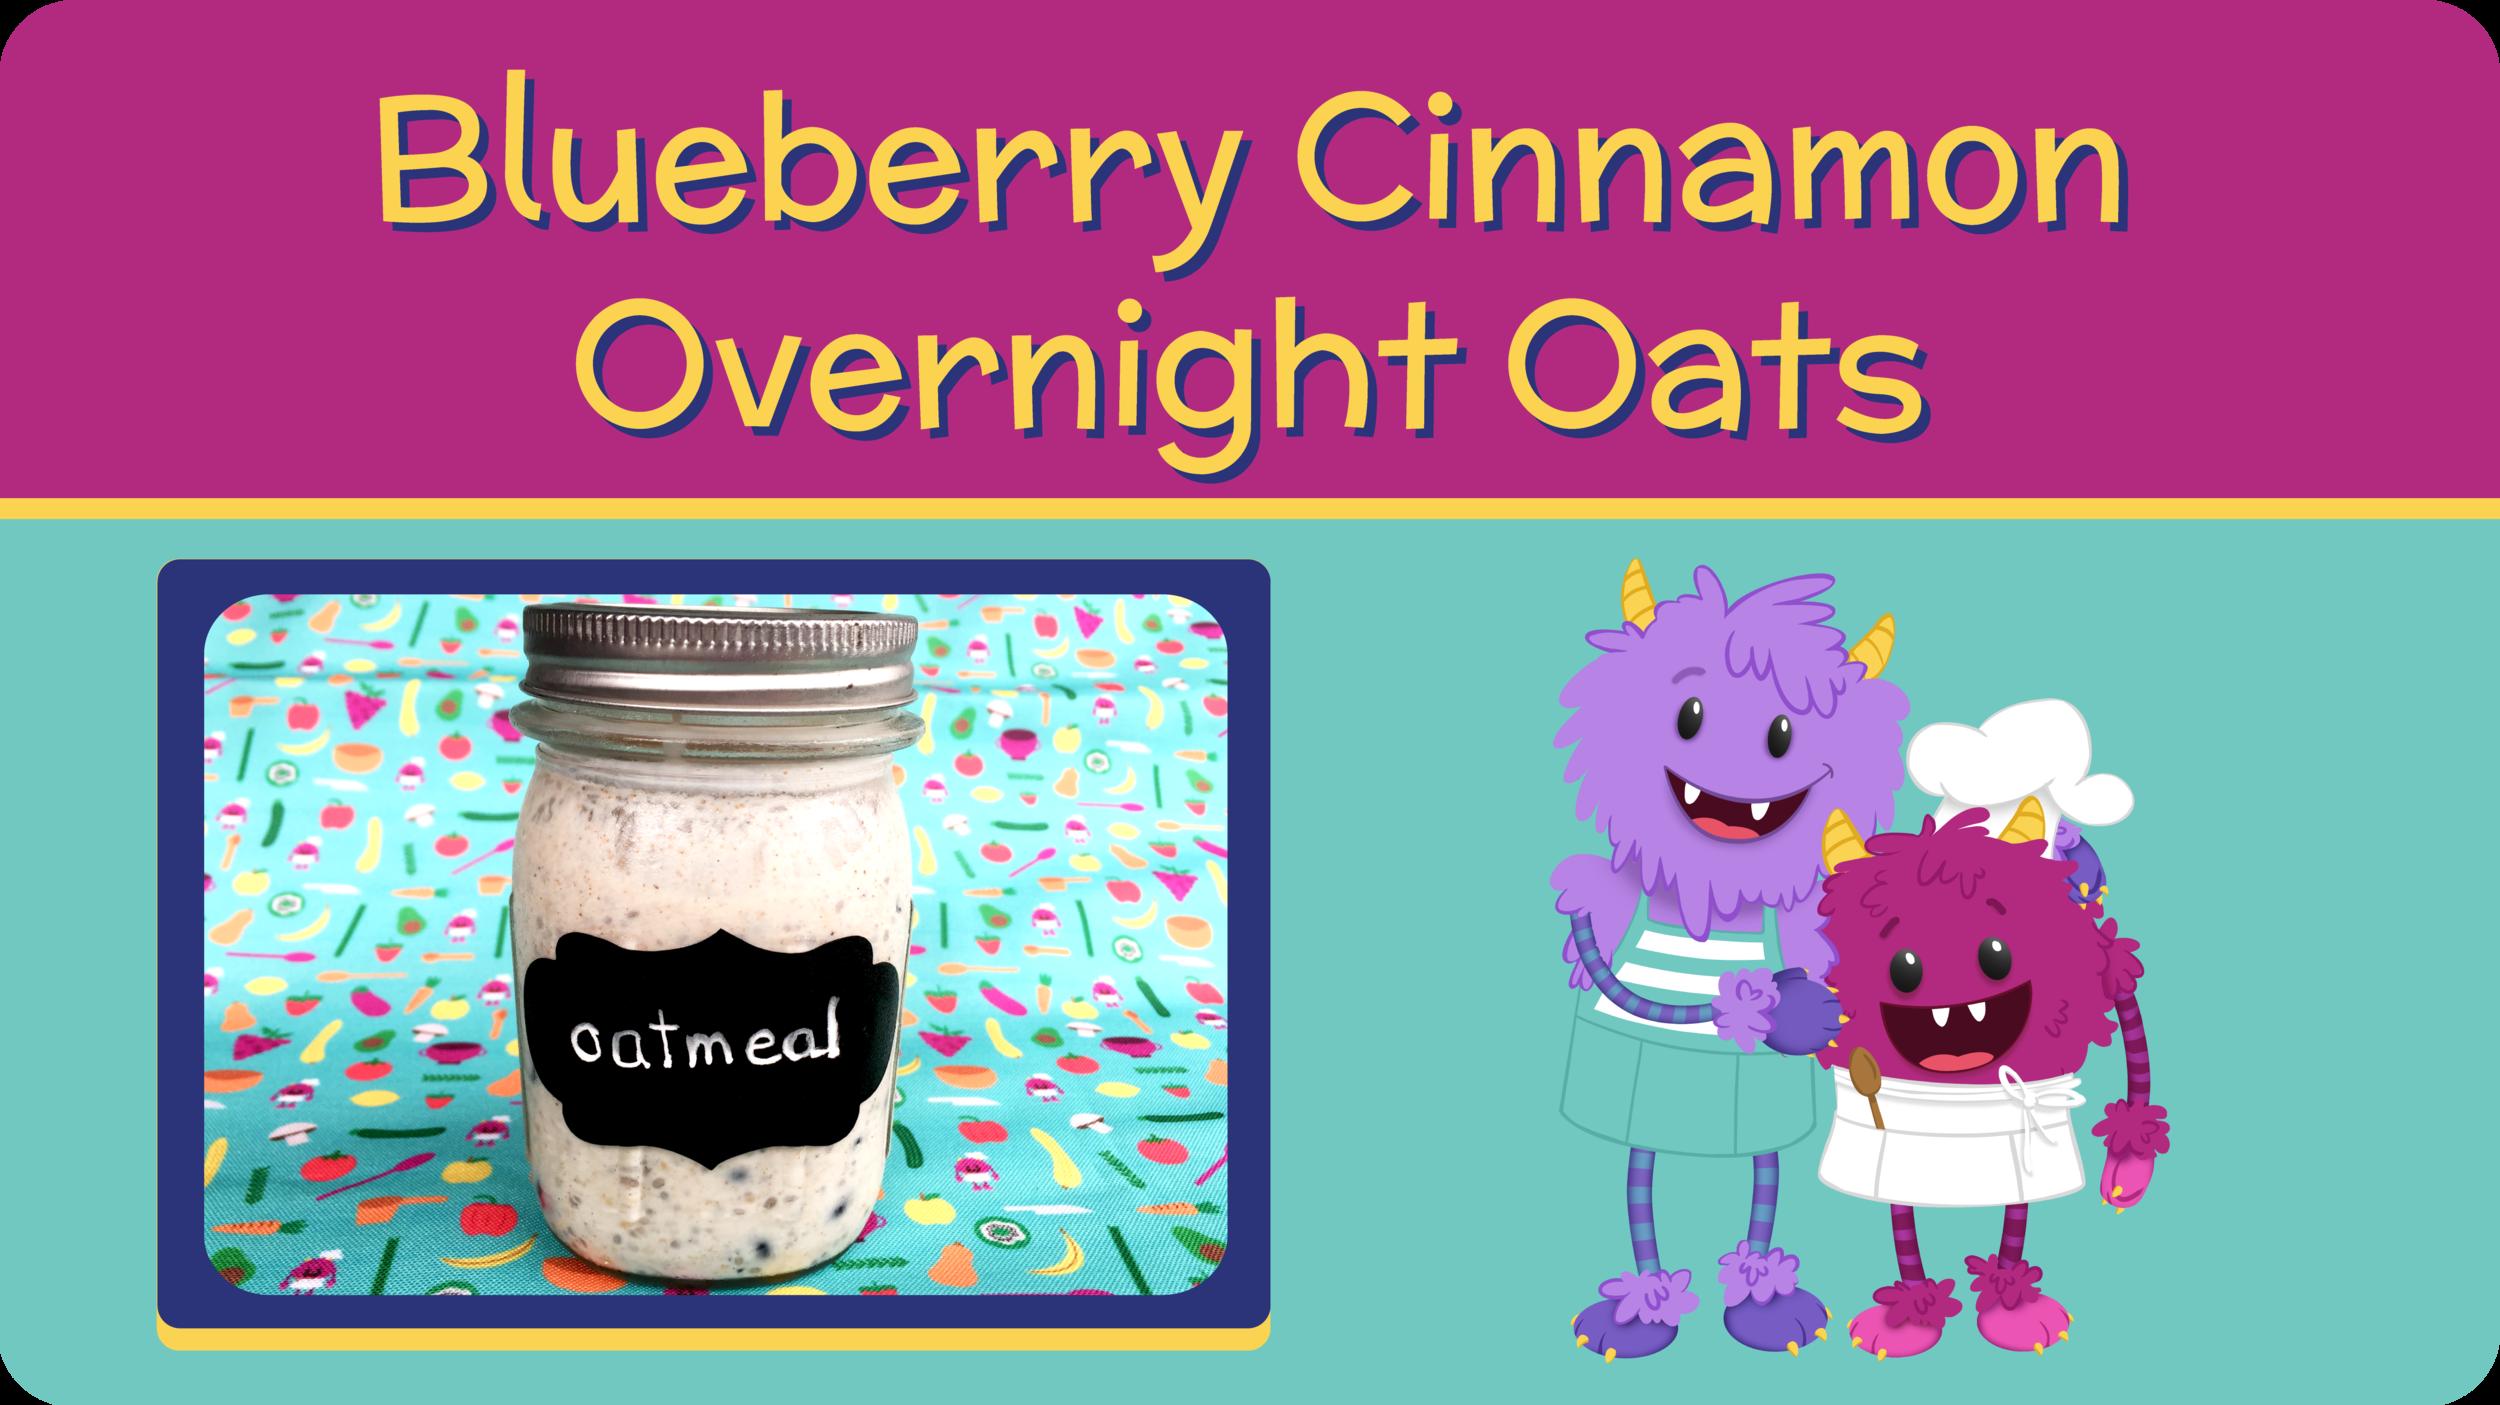 01_BlueberryCinnamon OvernightOats_Title.png